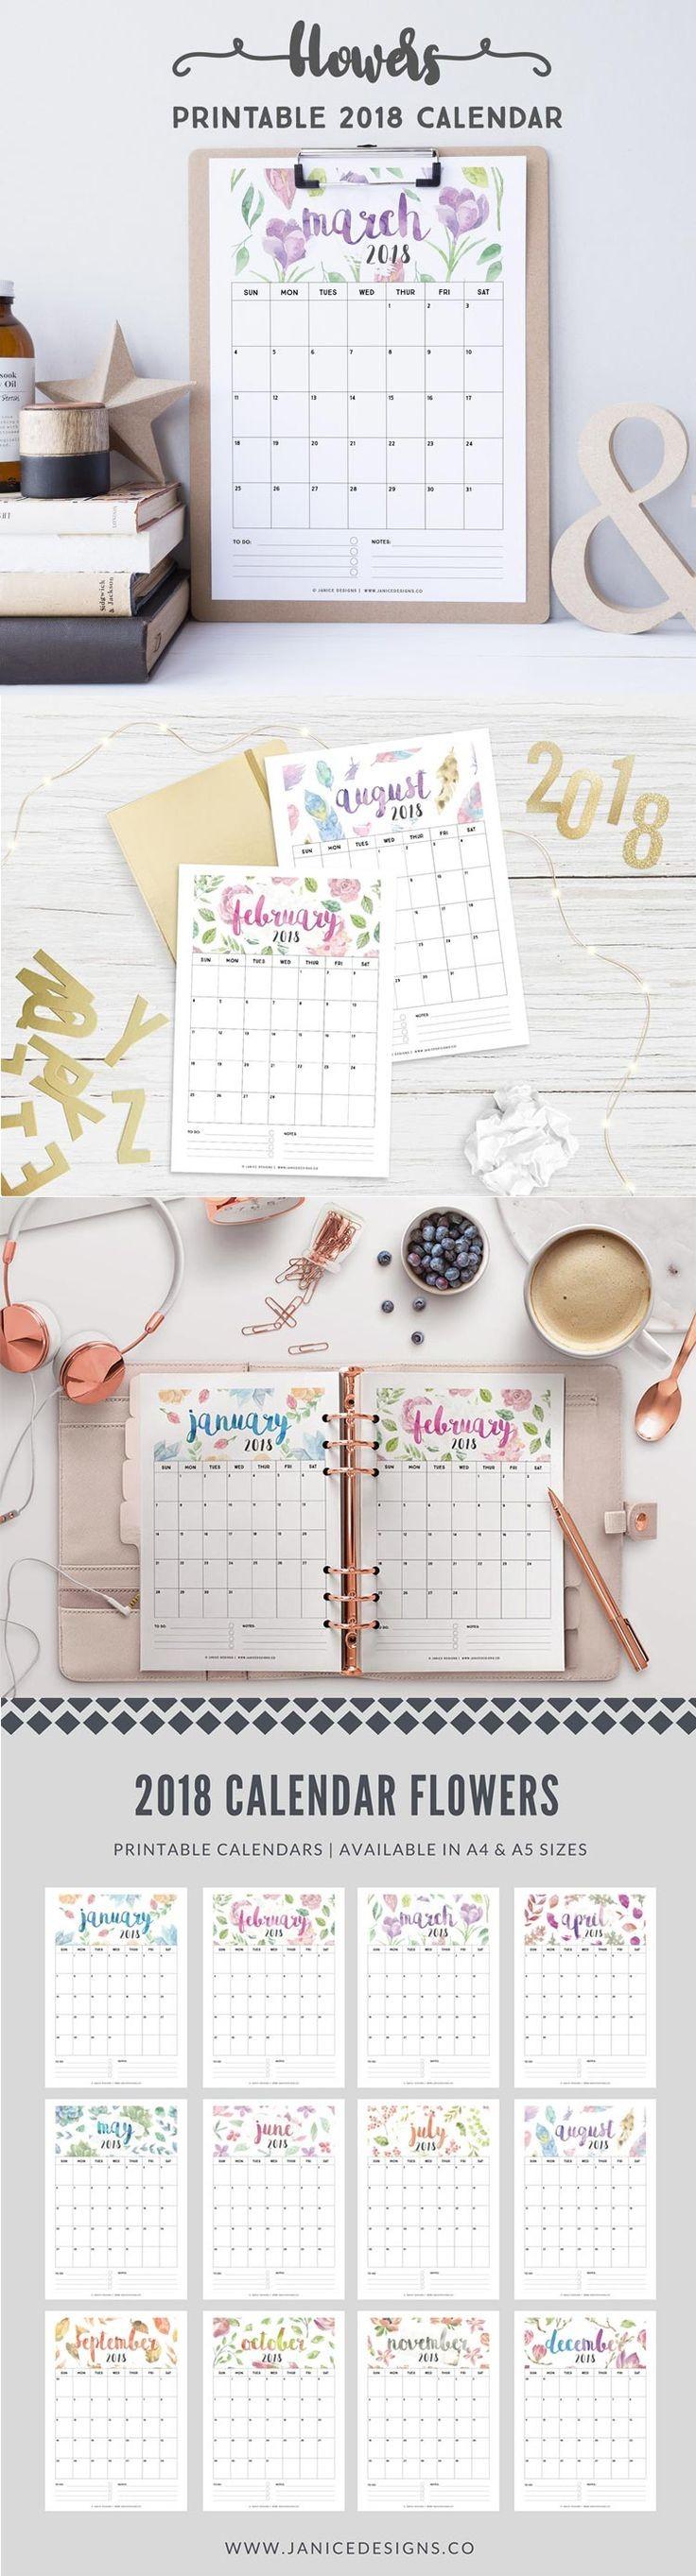 Calendario Con Horas Para Imprimir 2017 Más Recientemente Liberado 330 Best Planners Images On Pinterest Of Calendario Con Horas Para Imprimir 2017 Recientes 52 Best Life organization Images On Pinterest